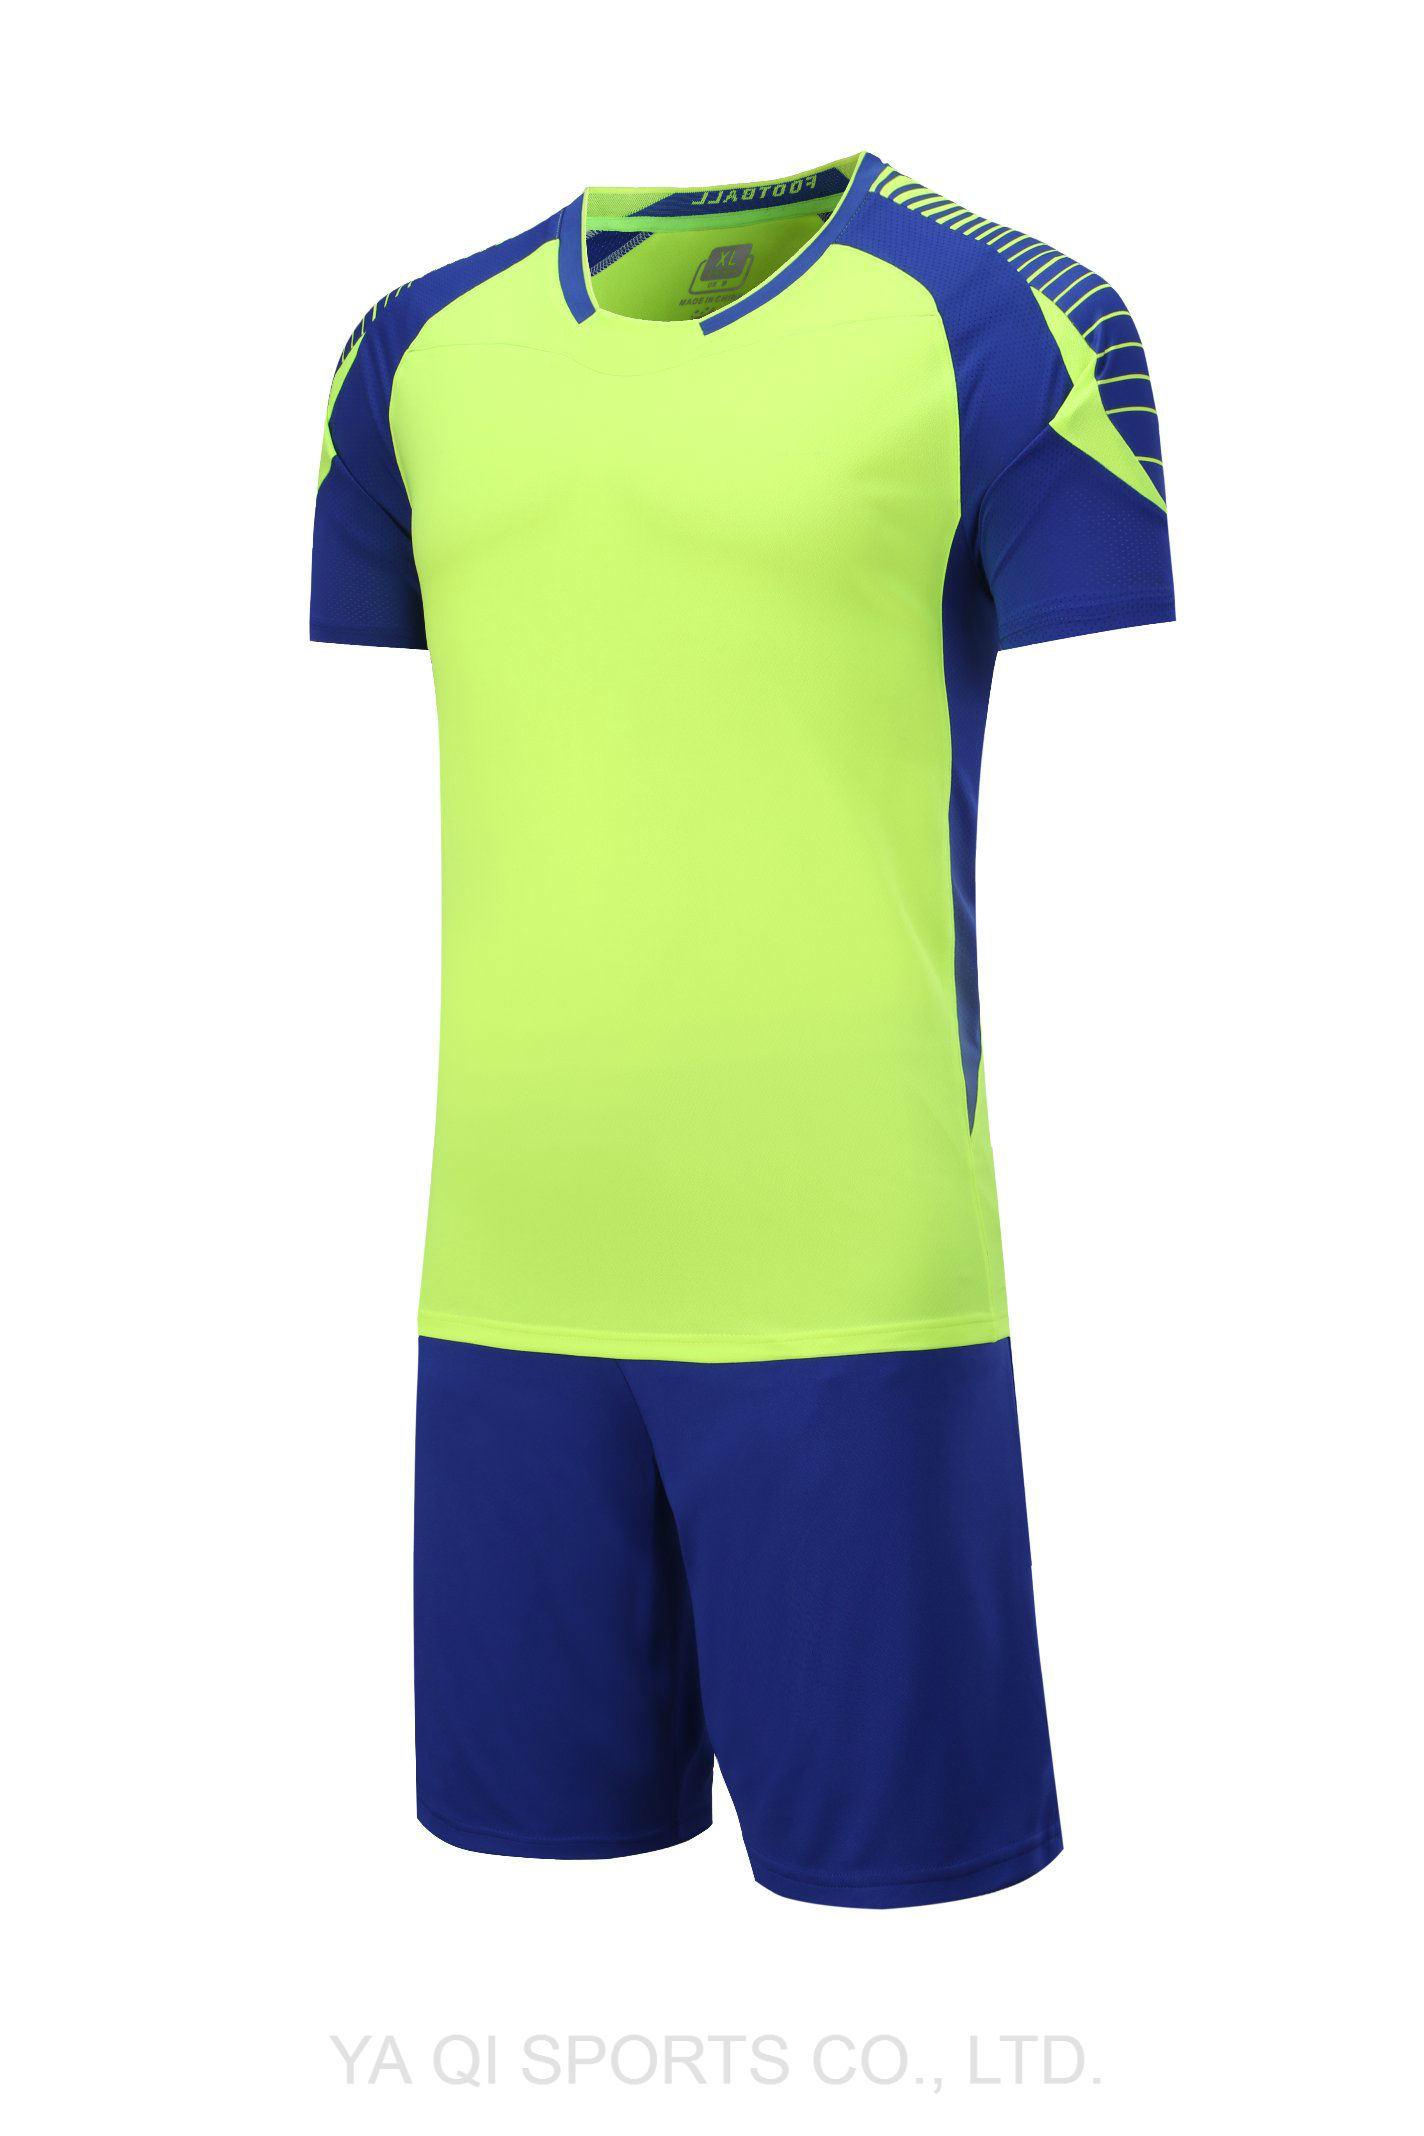 Cheap Team Soccer Shirts - Cotswold Hire 15cc553b9